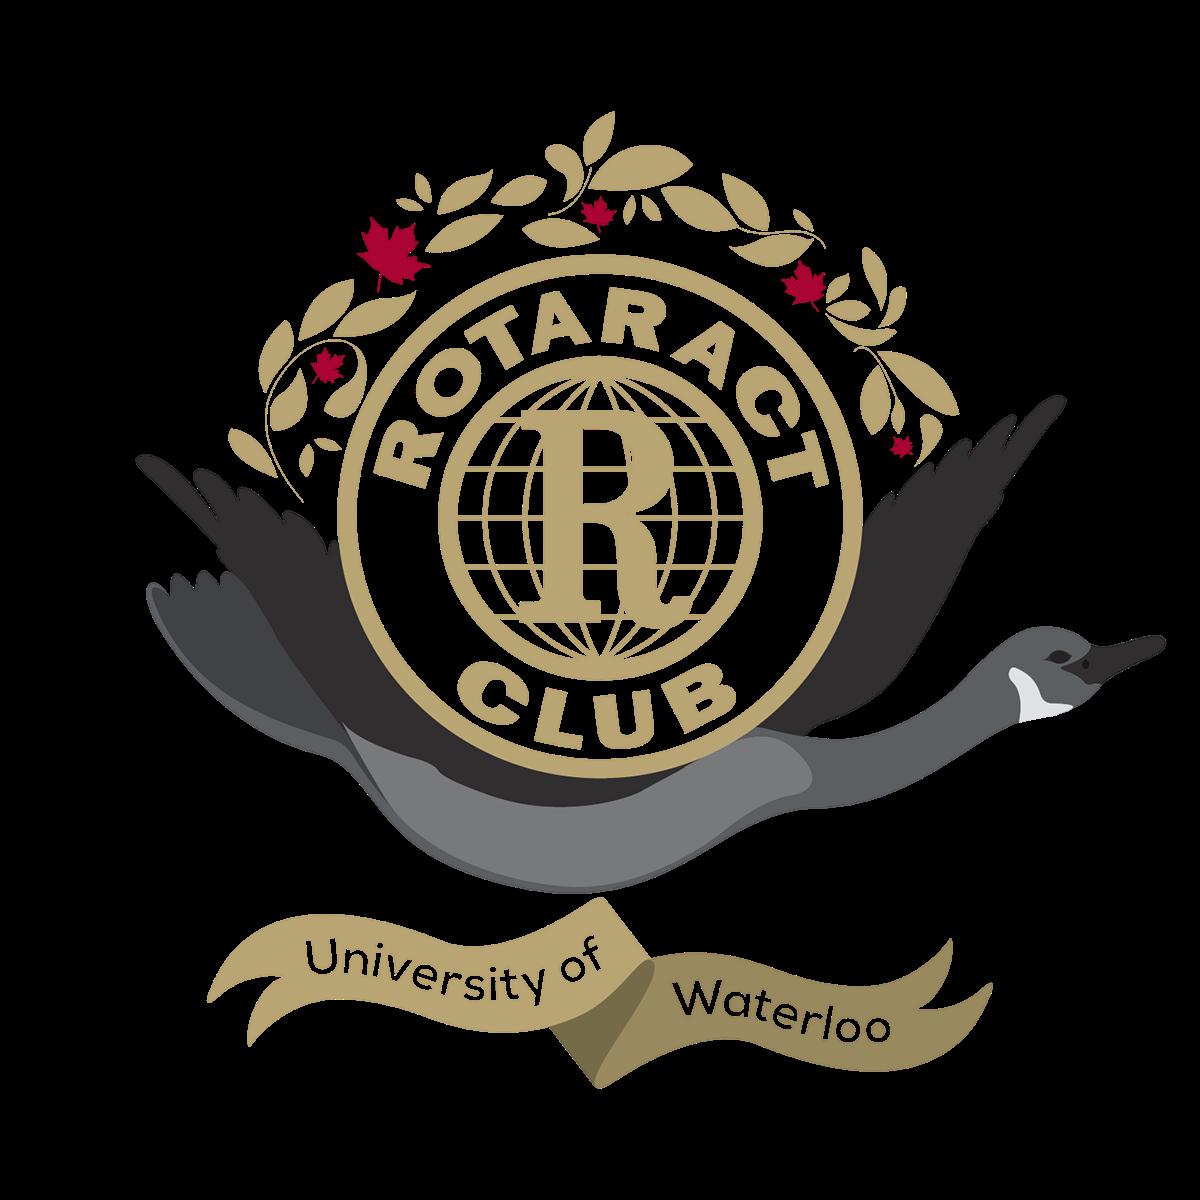 UW Rotaract Club Logo on Student Show.